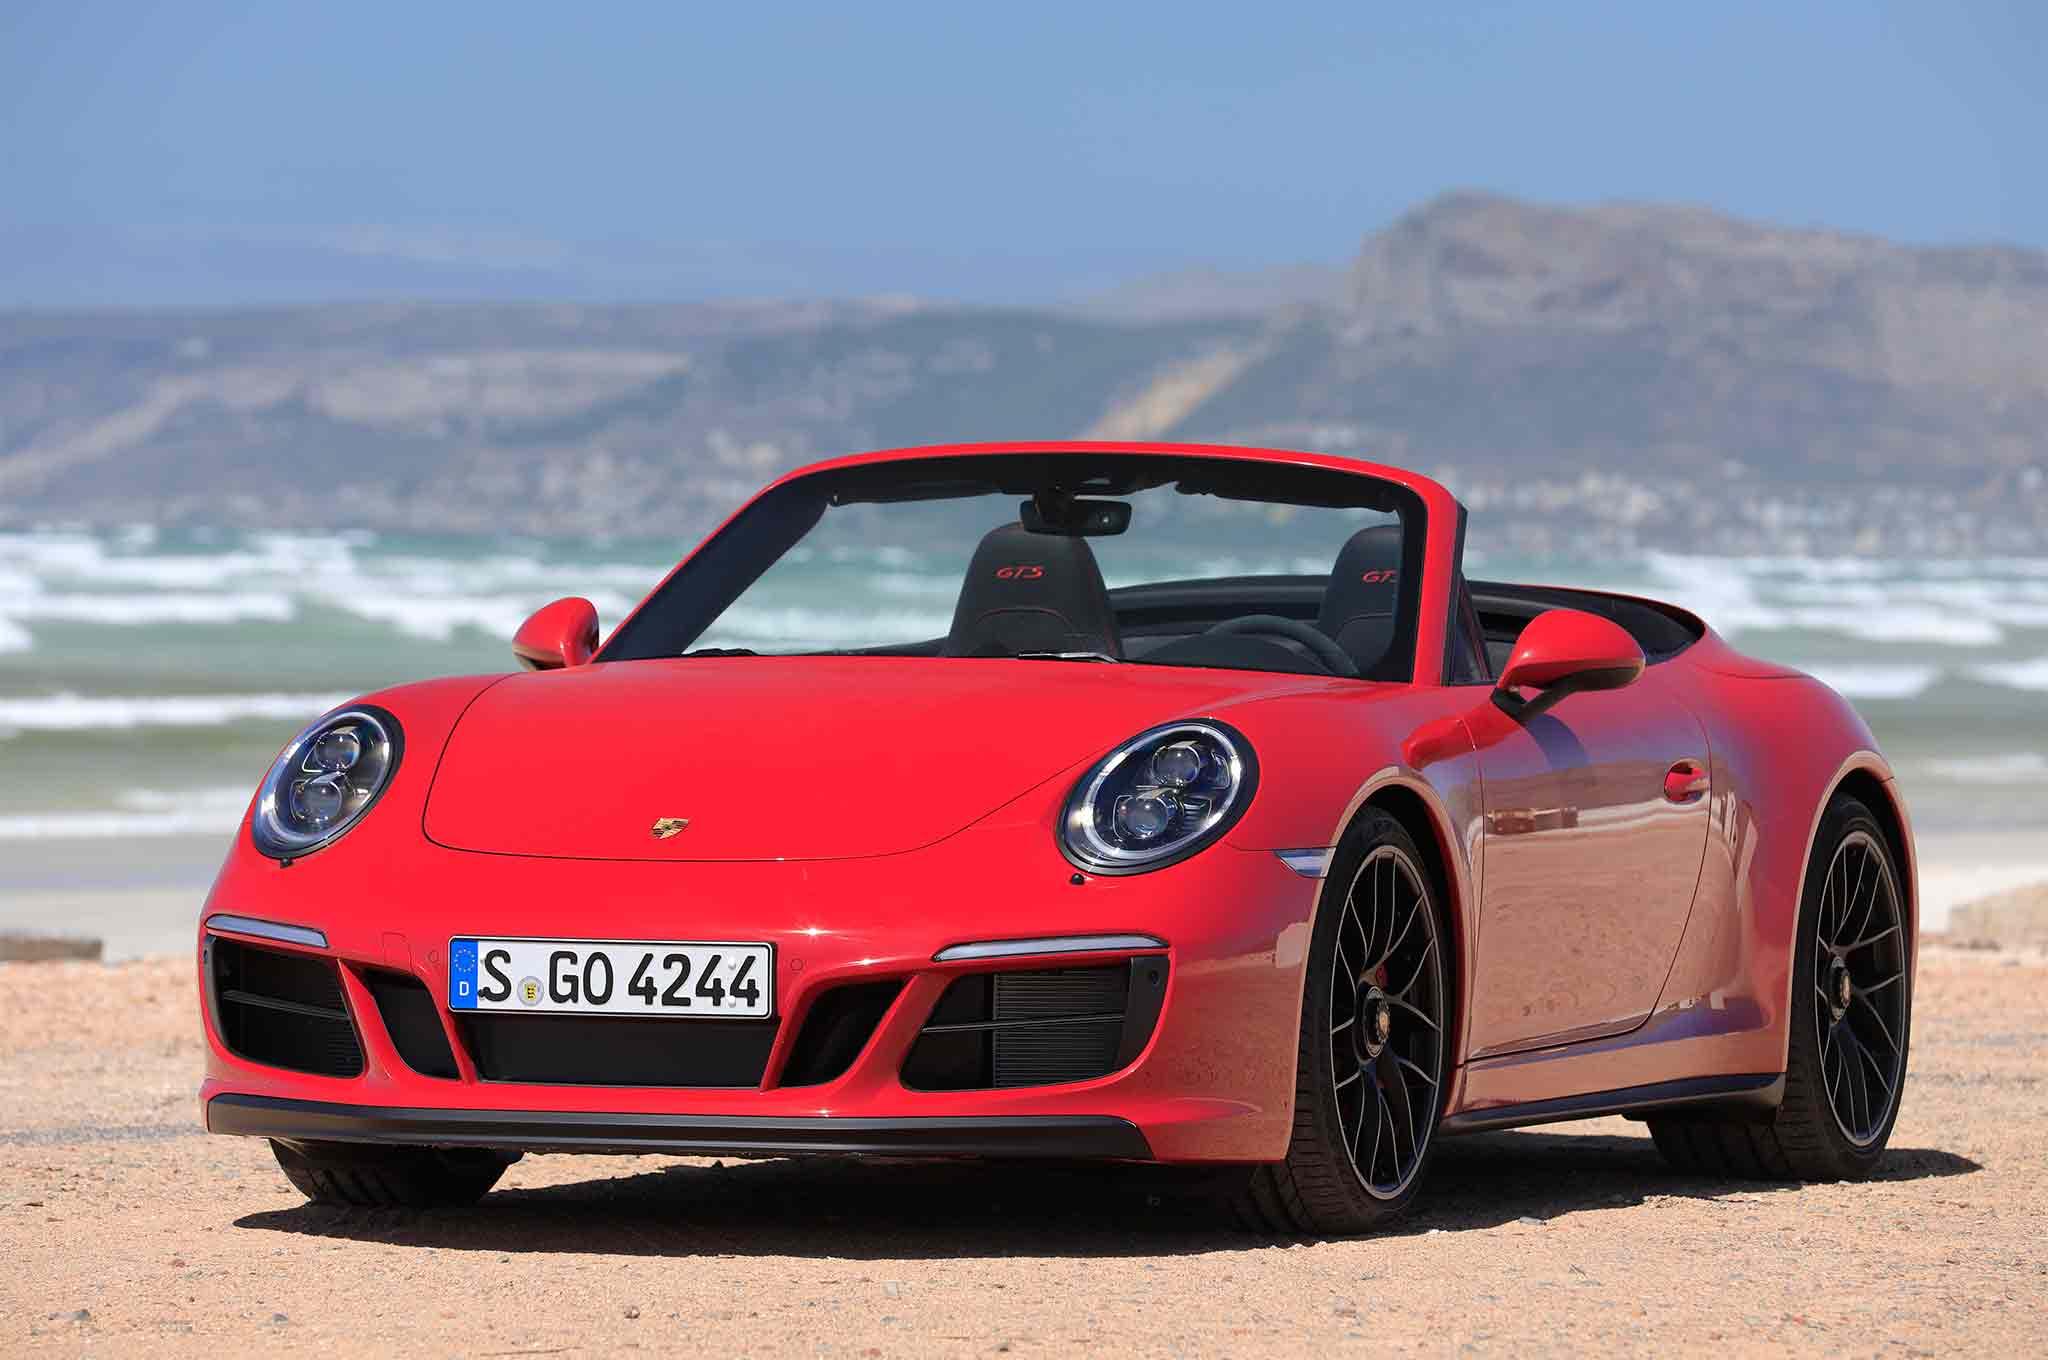 2017 porsche 911 carrera gts first drive review | automobile magazine